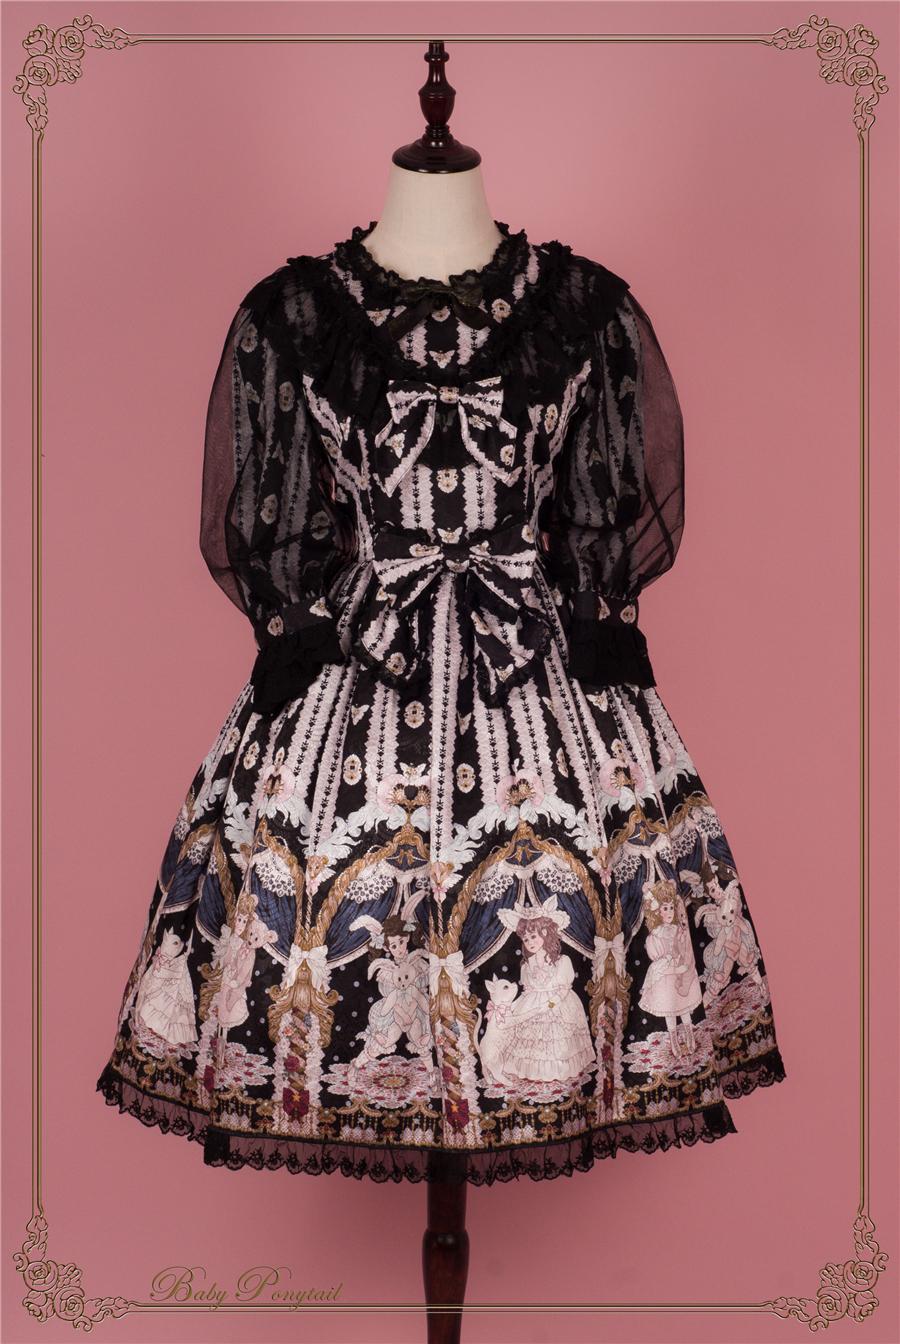 BabyPonytail_Stock Photo_My Favorite Companion_OP Black_0.jpg